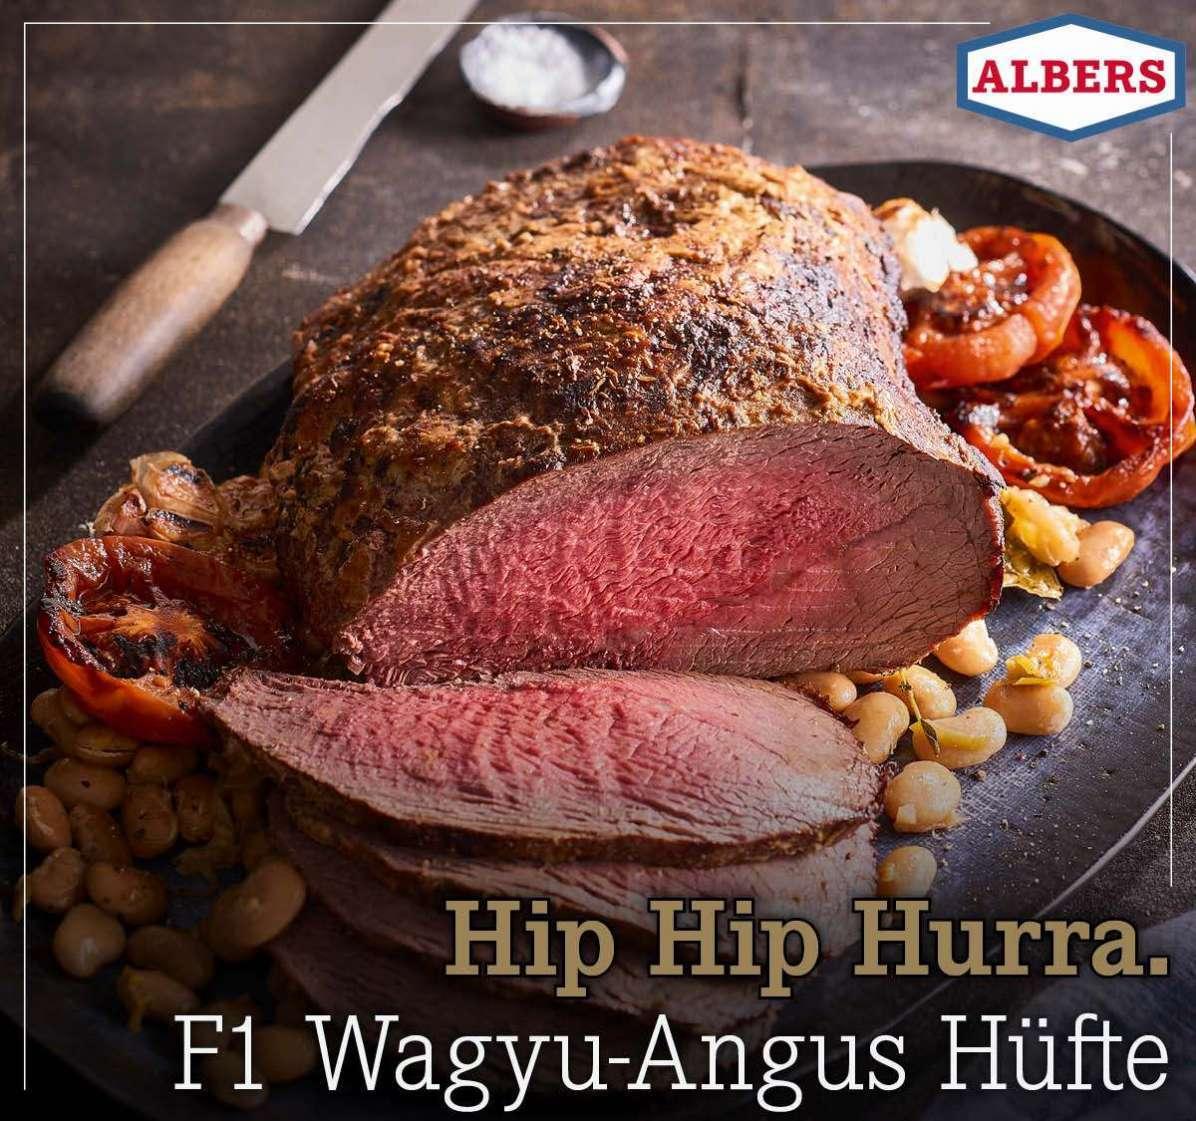 Hip Hip Hurra. F1 Wagyu-Angus Hüfte